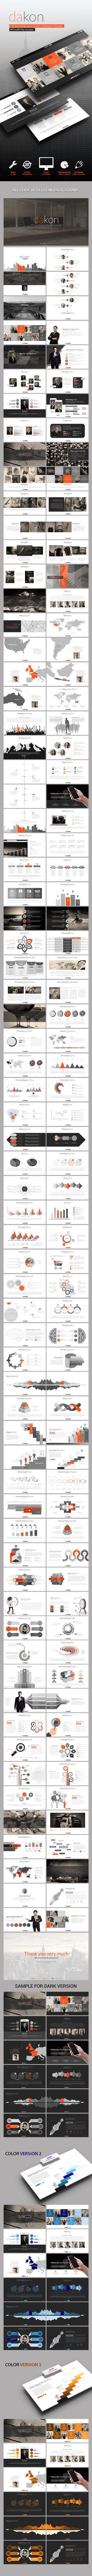 Dakon Powerpoint Template - Business PowerPoint Templates